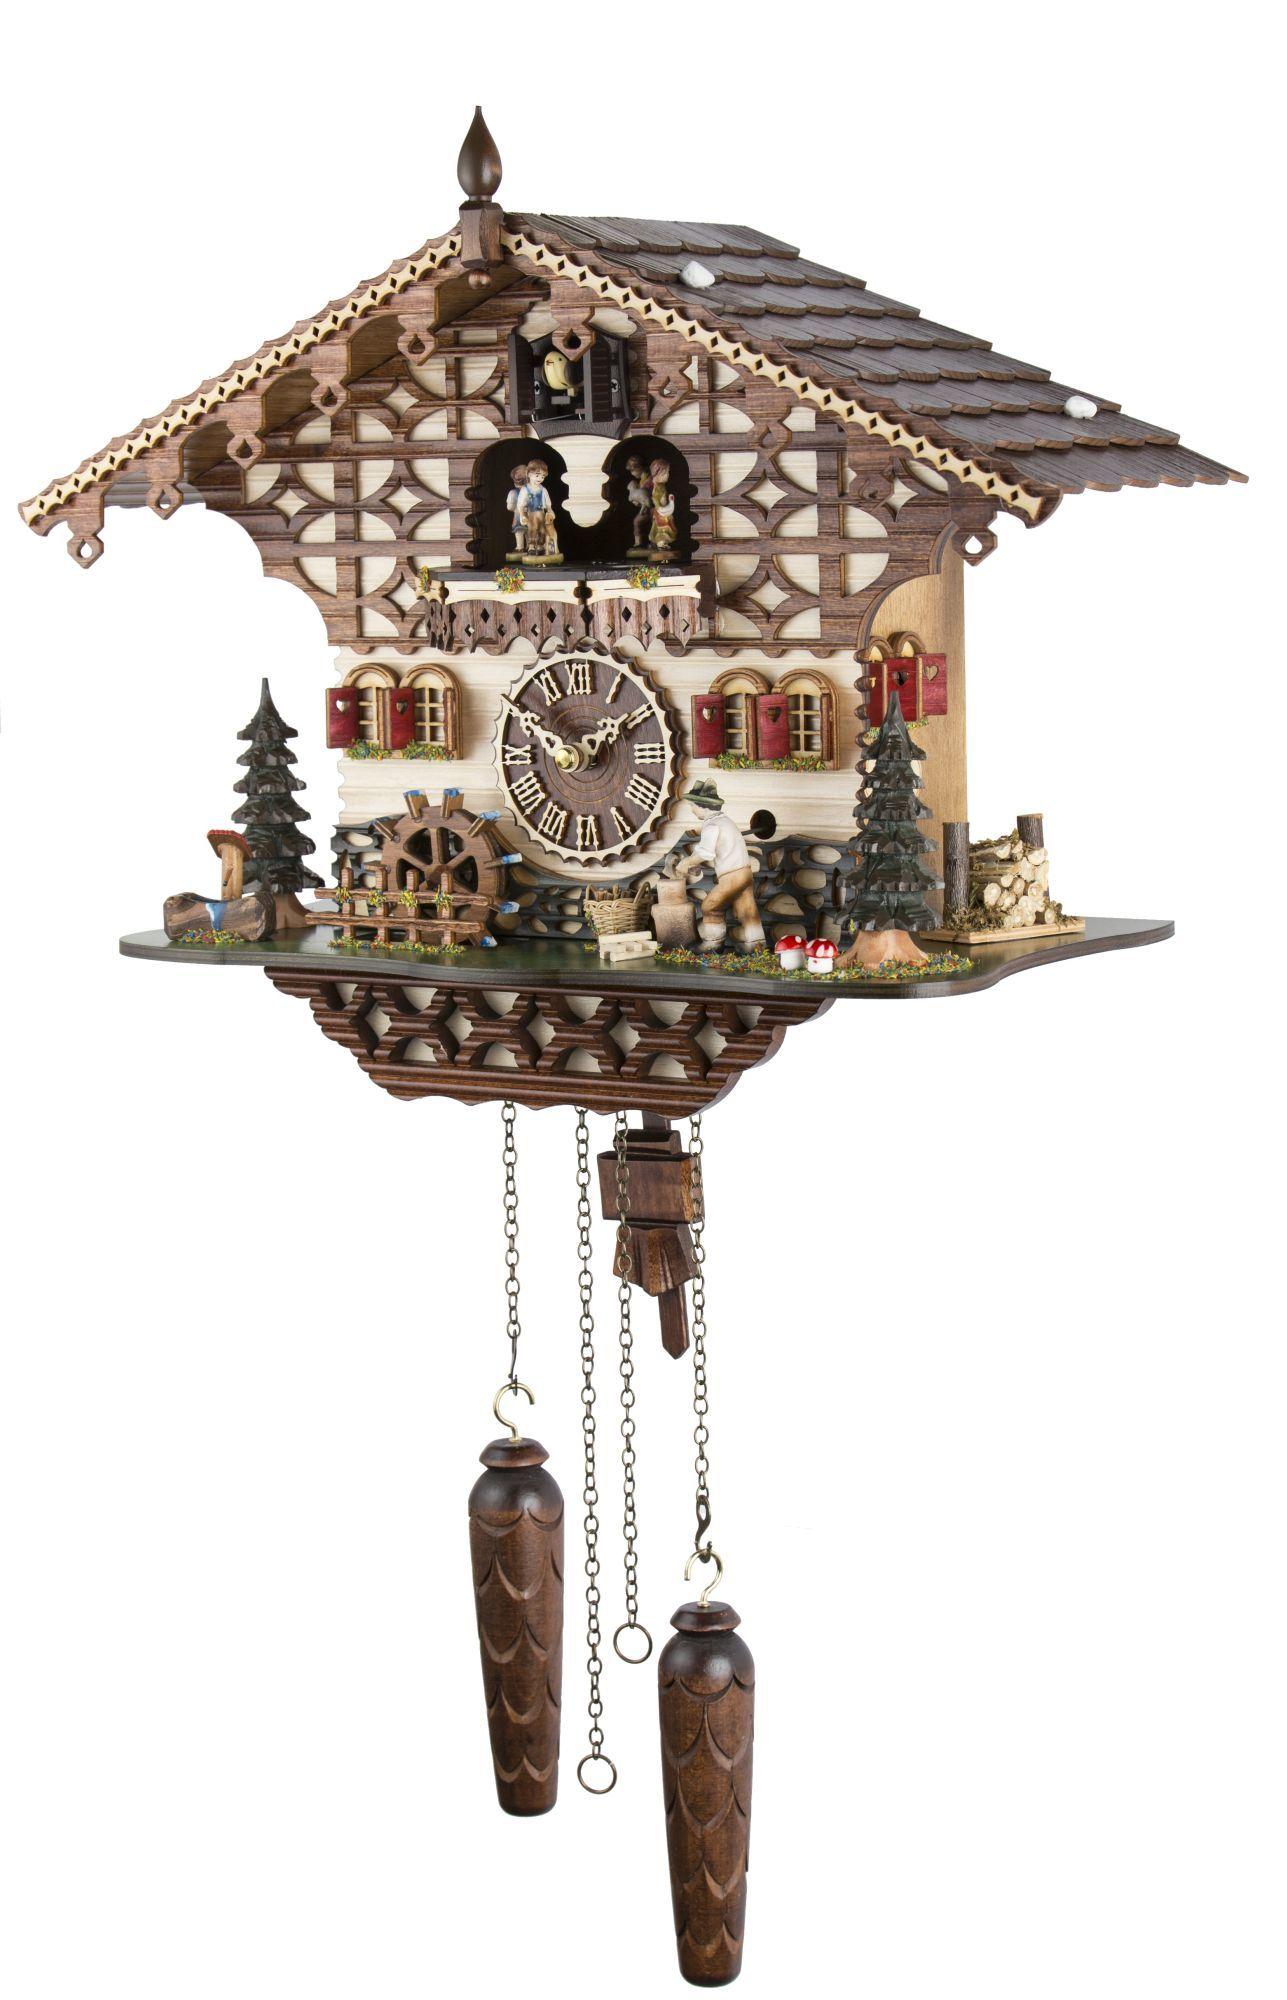 Часы настенные Часы настенные с кукушкой Tomas Stern 5032 chasy-nastennye-s-kukushkoy-tomas-stern-5032-germaniya.jpg